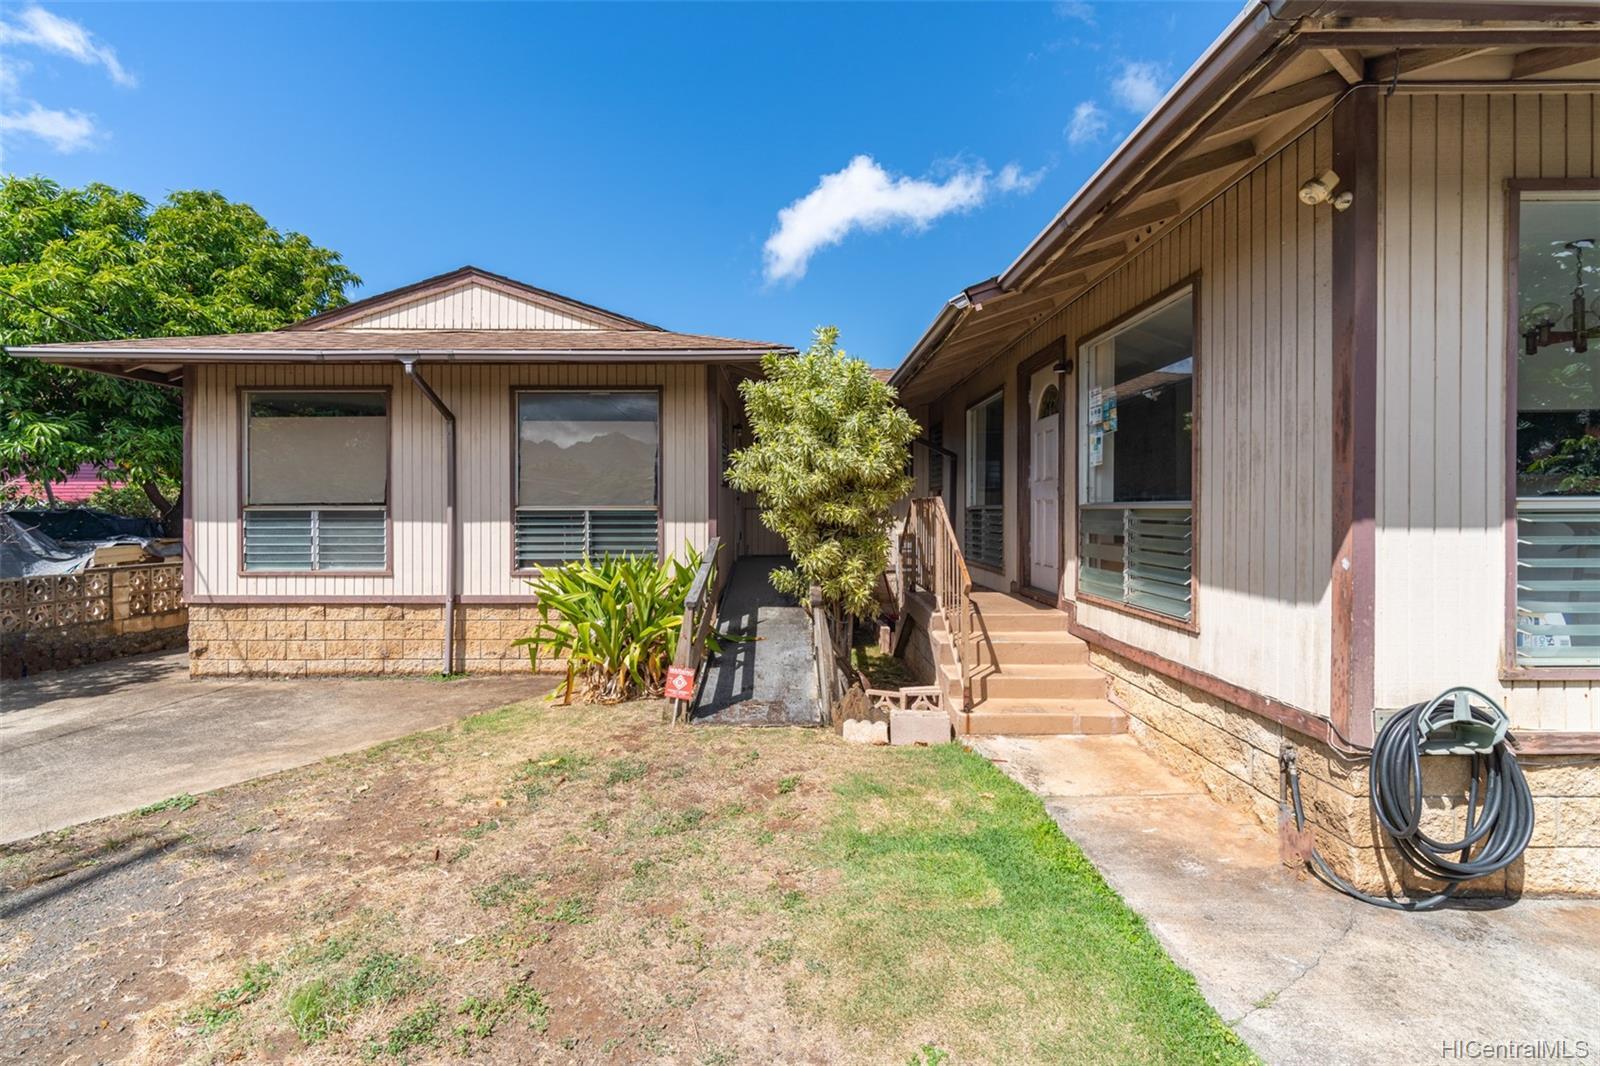 1214 Kamehameha IV Road Honolulu - Multi-family - photo 6 of 20